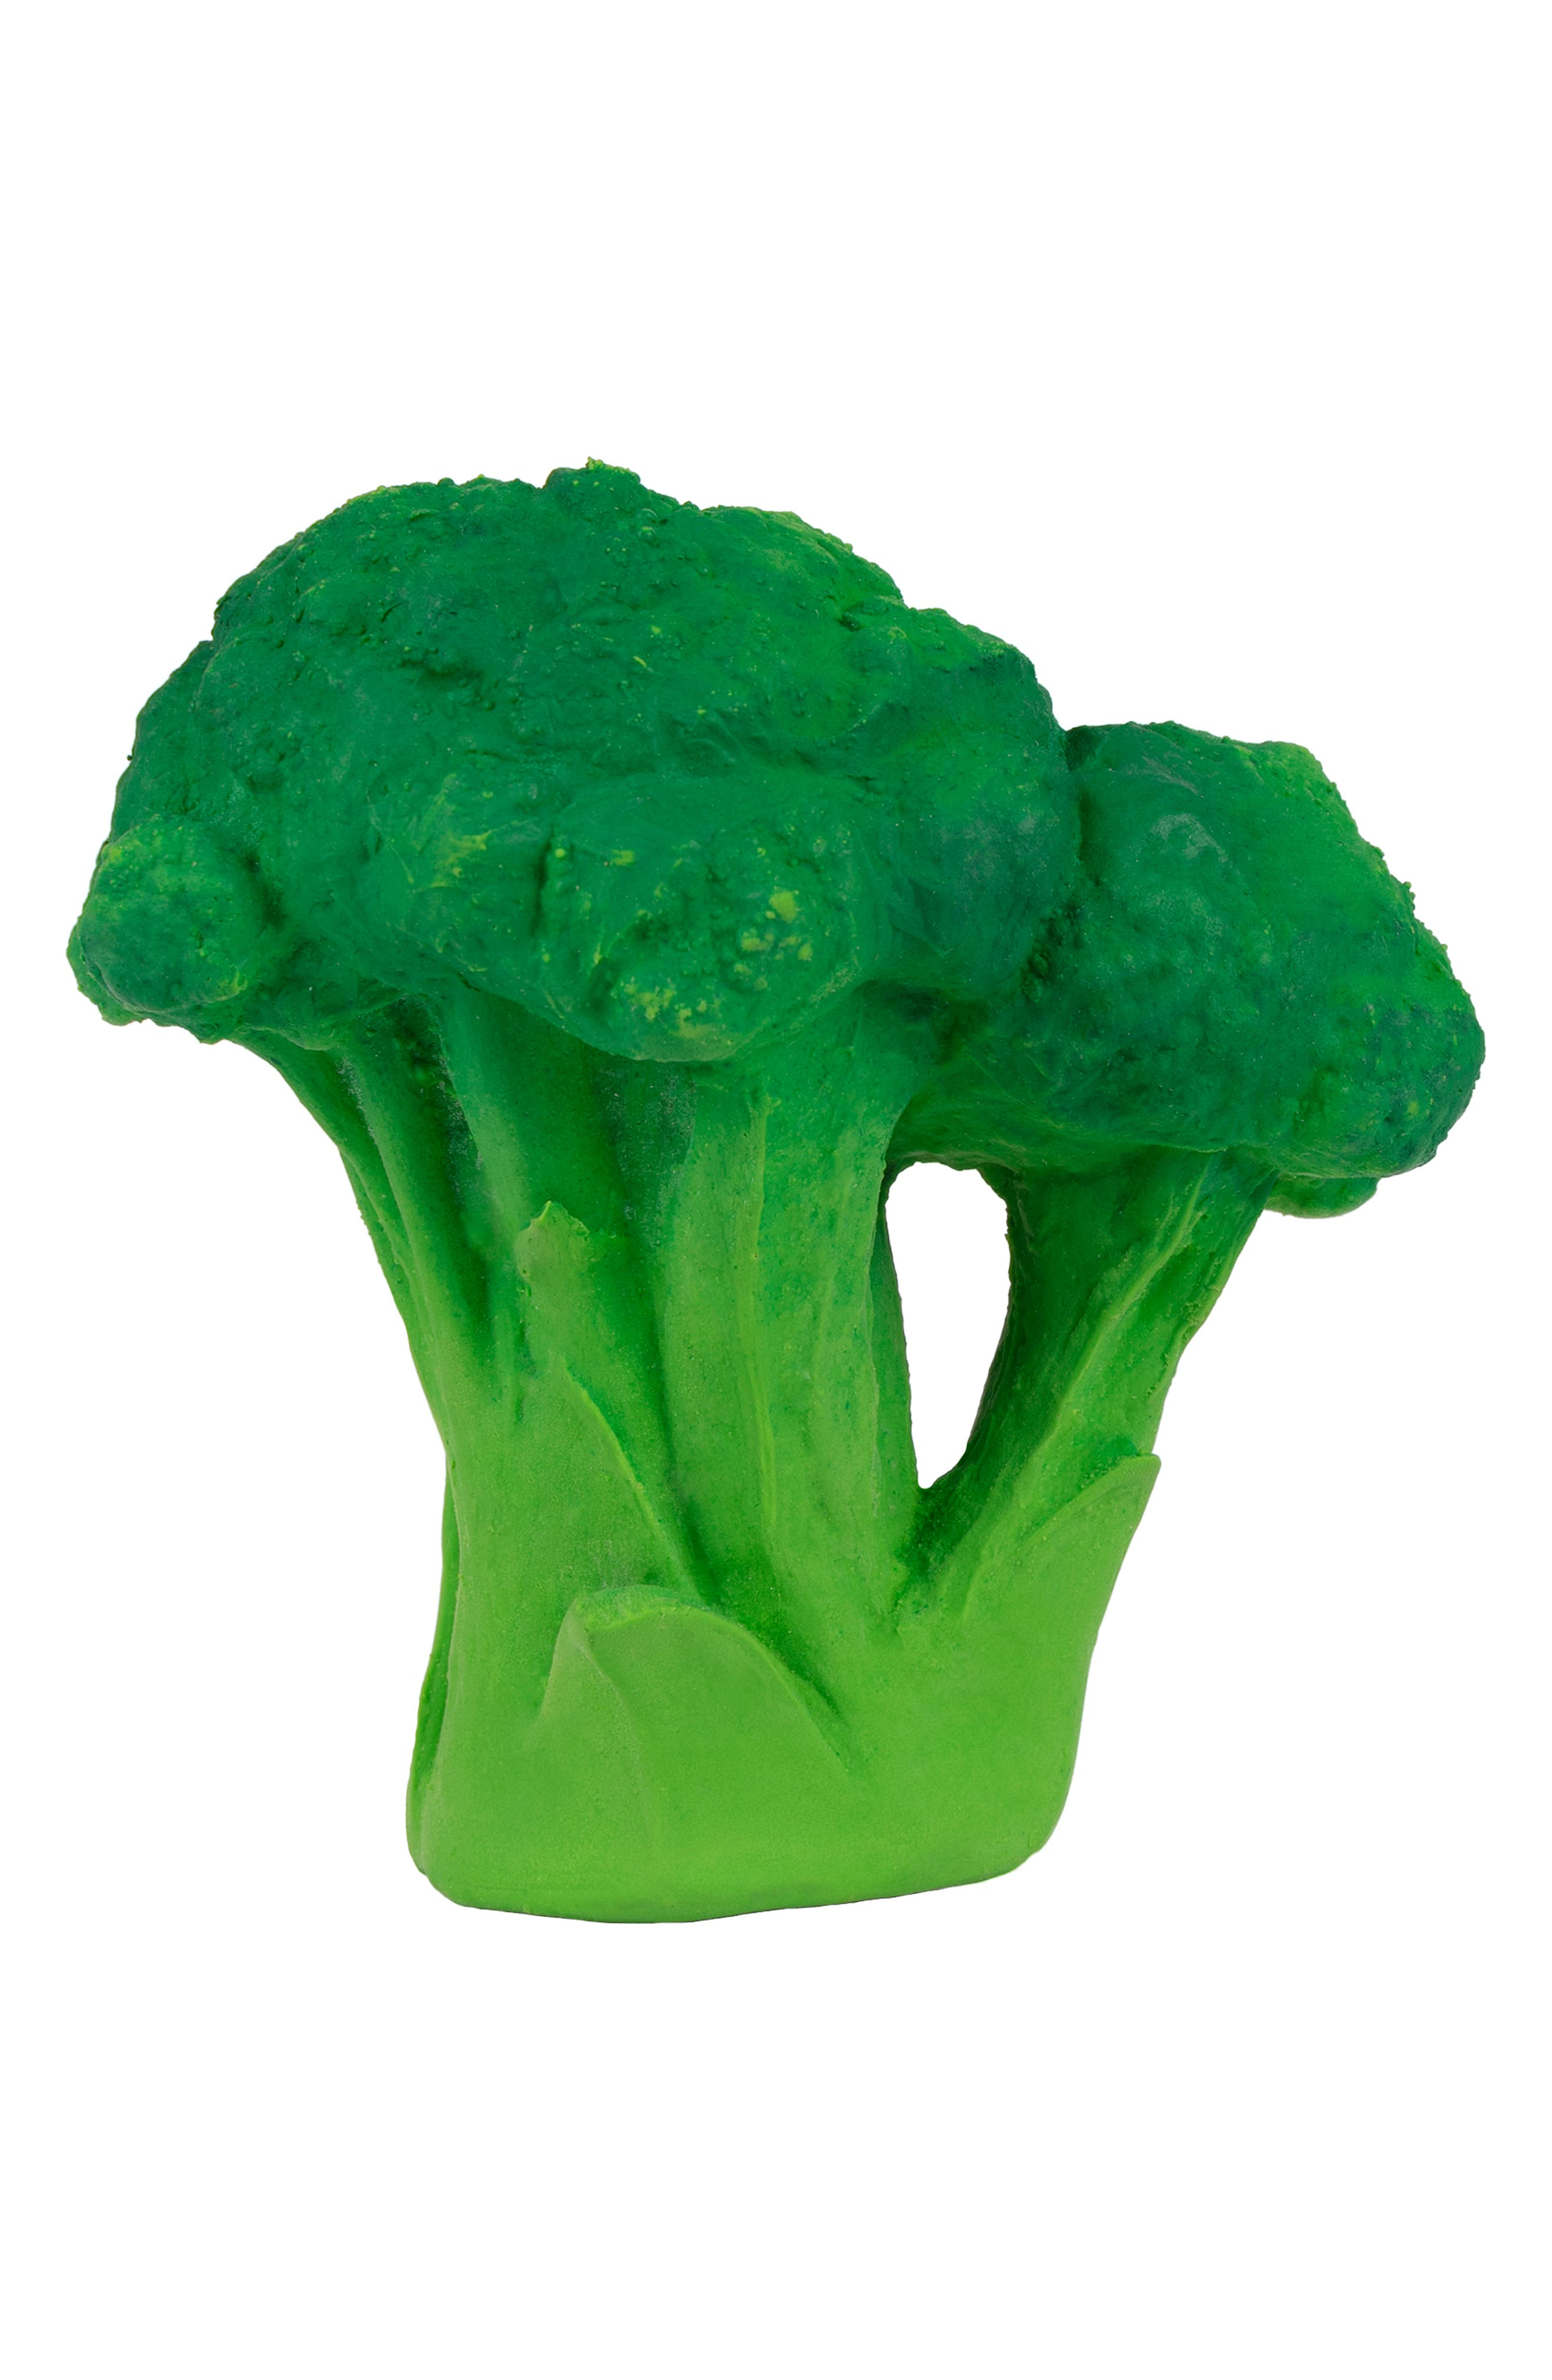 OLI & CAROL, Oli and Carol Brucy the Broccoli Teething Toy, Alternate thumbnail 2, color, GREEN